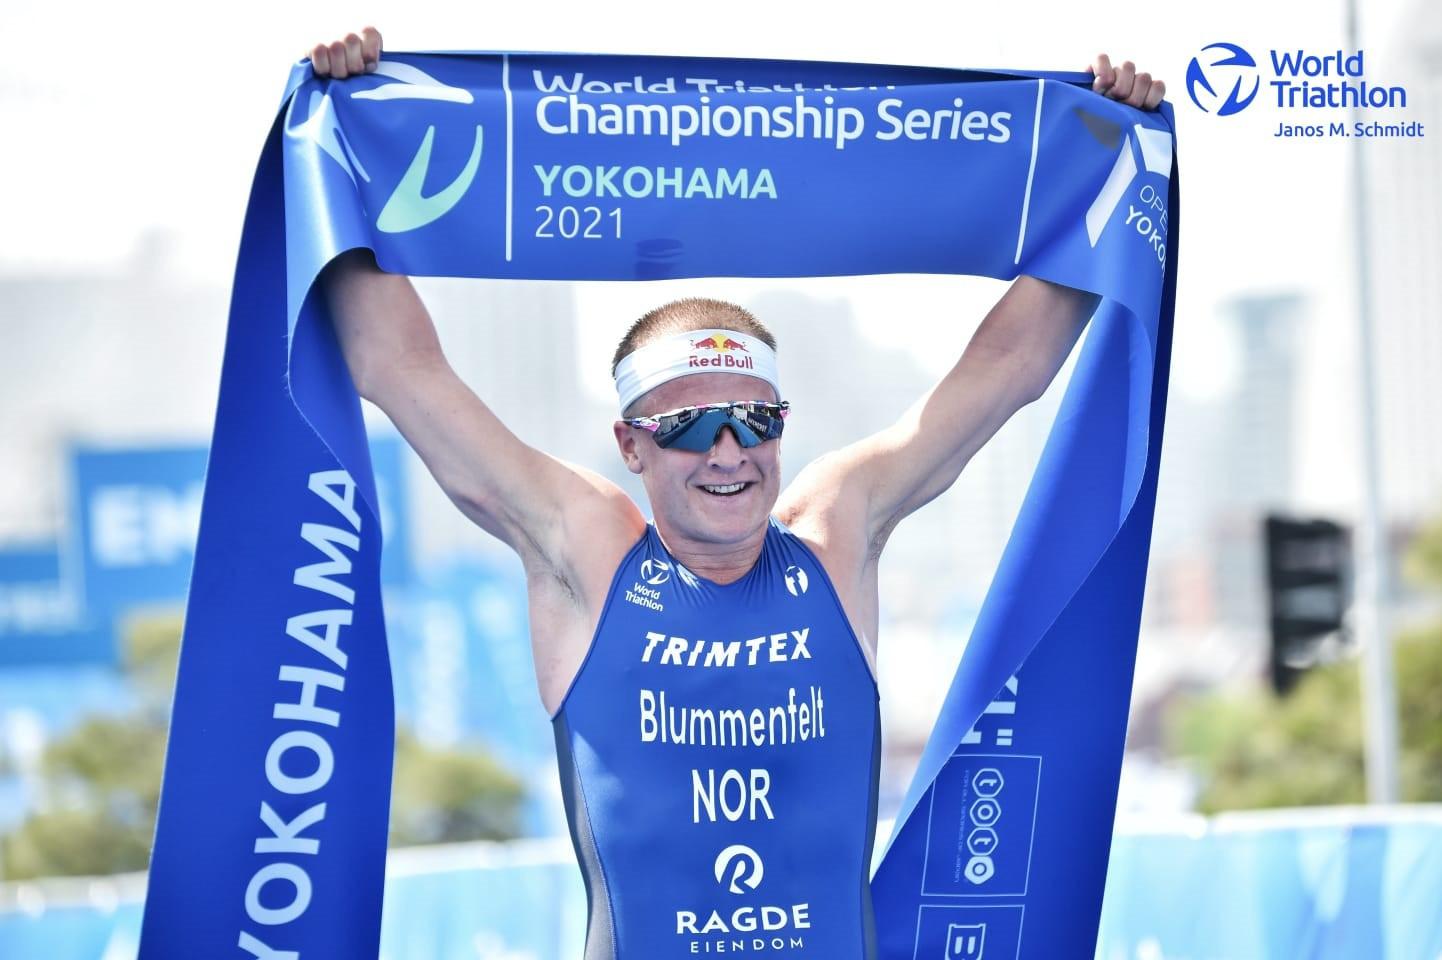 Blummenfelt and Knibb win World Triathlon Championship Series races in Yokohama